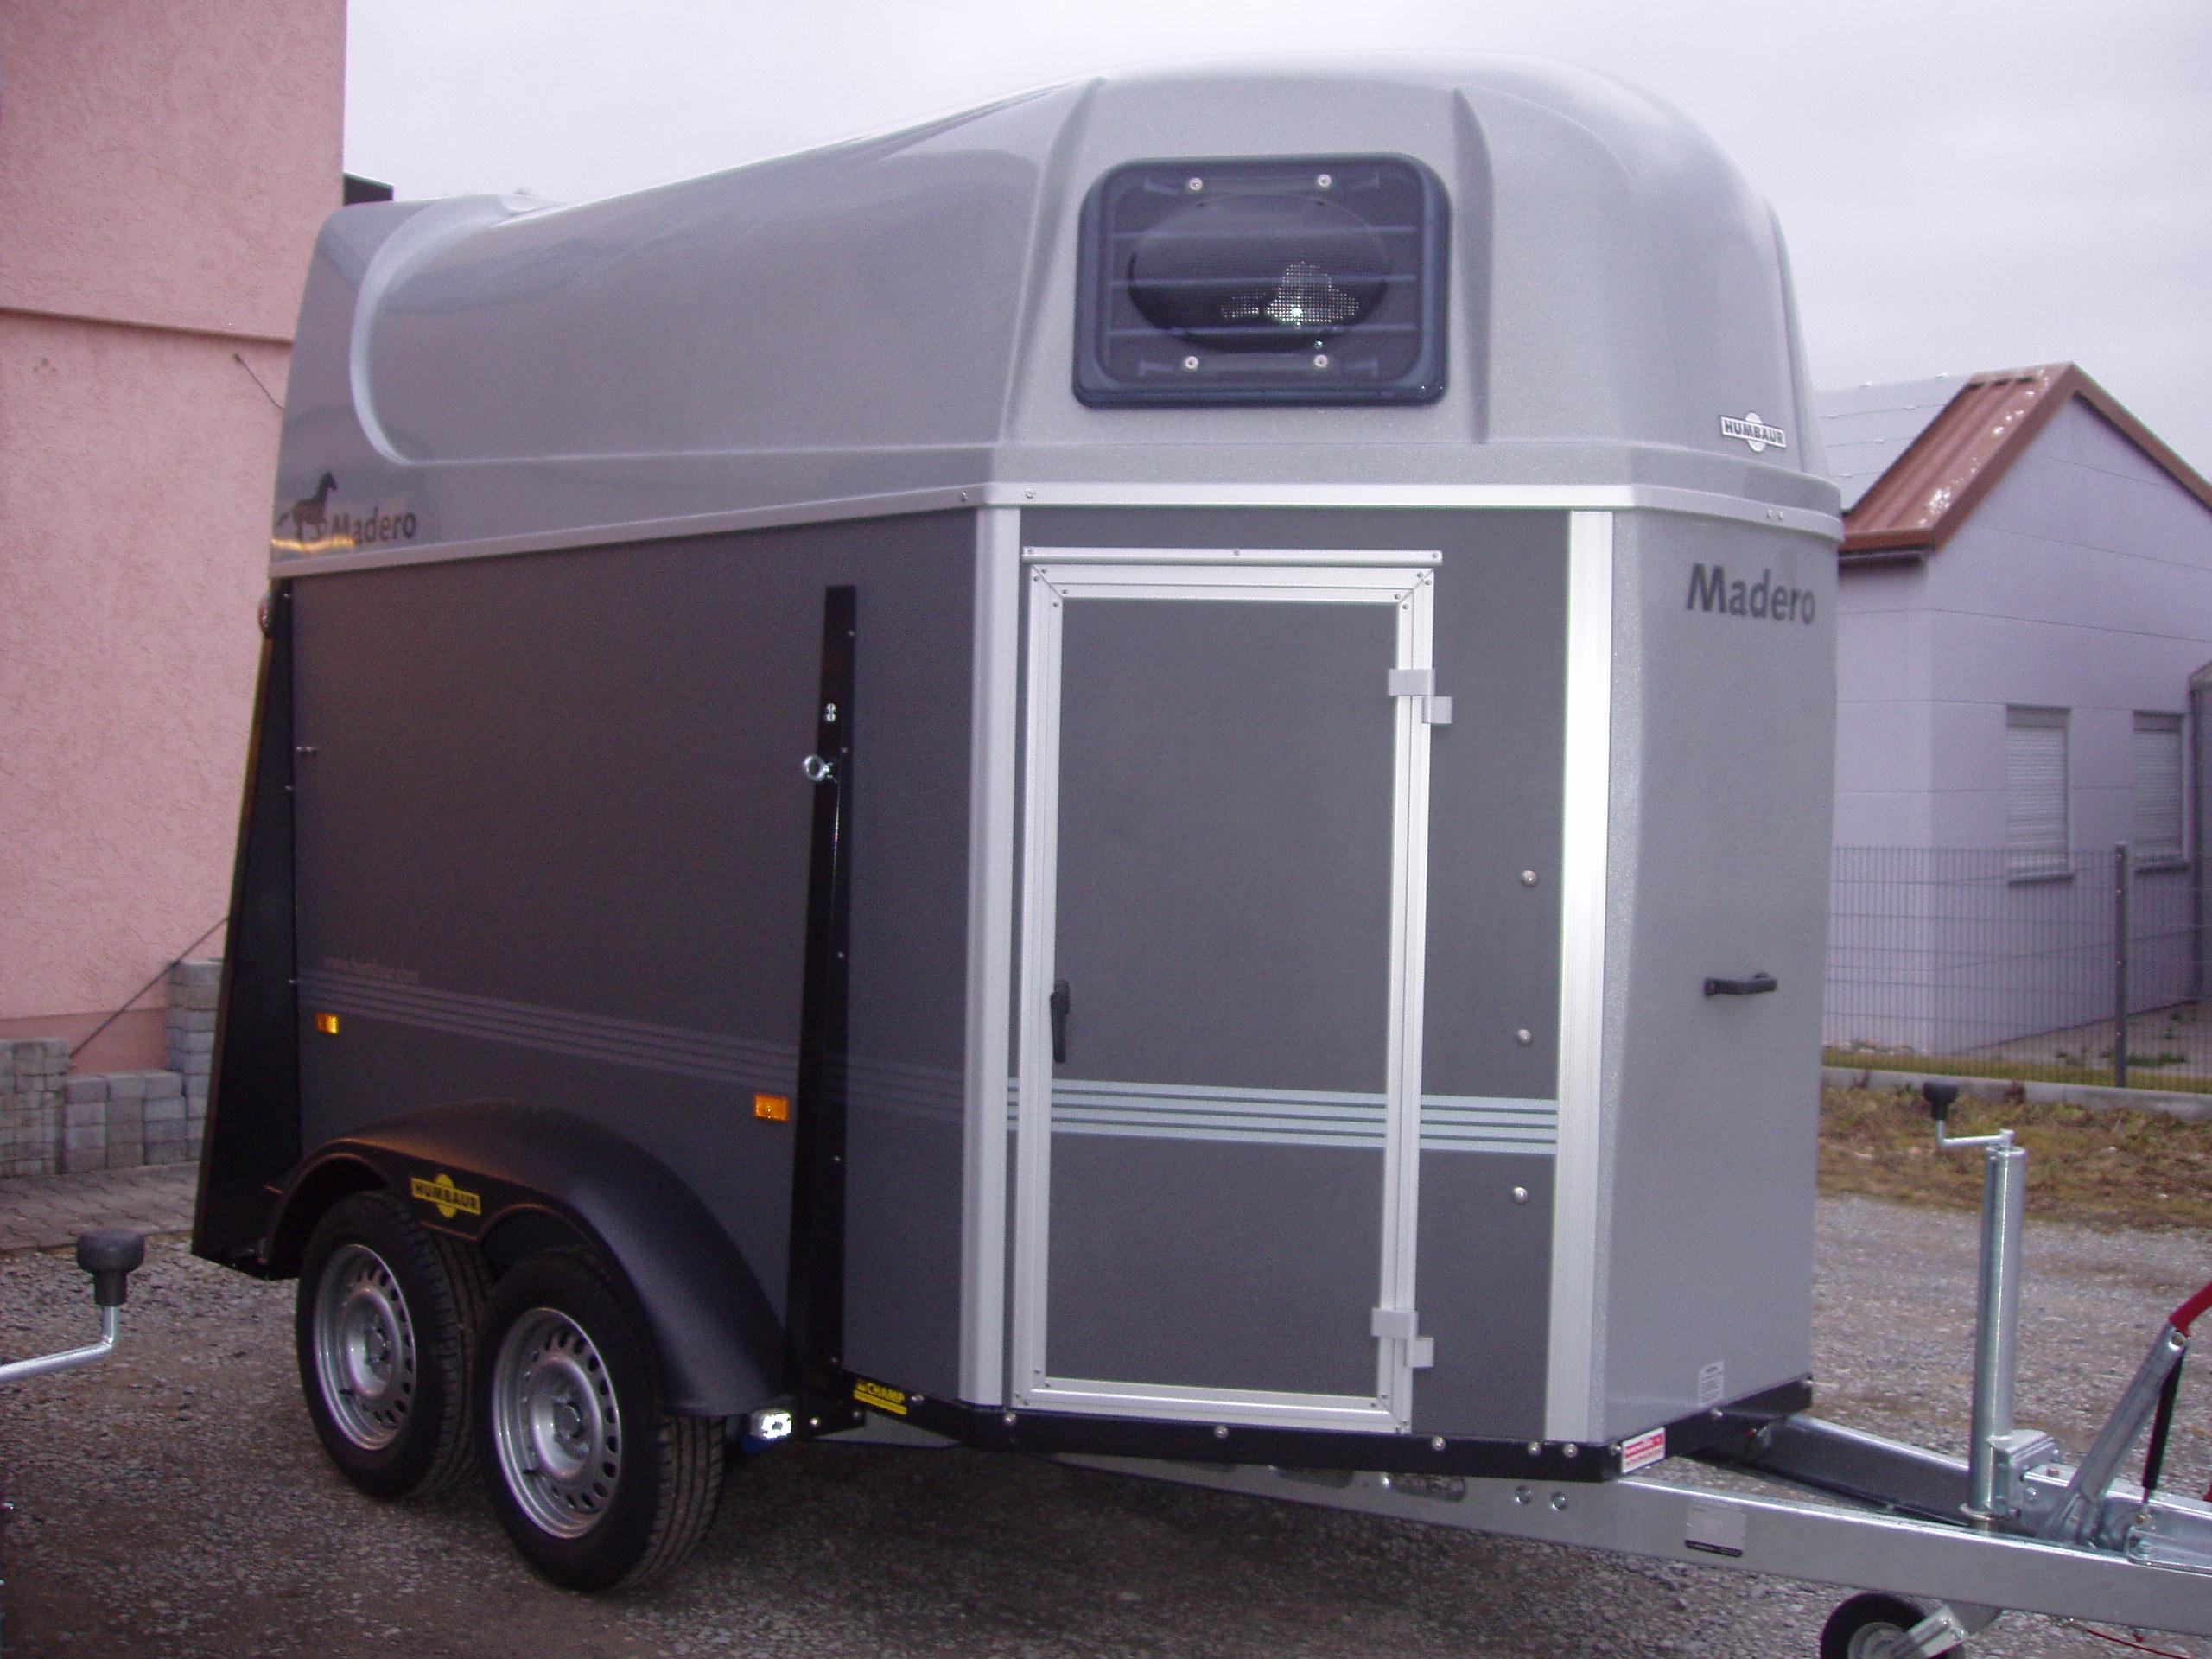 pferdeanh nger humbaur carrus ausstellungsanh nger in. Black Bedroom Furniture Sets. Home Design Ideas